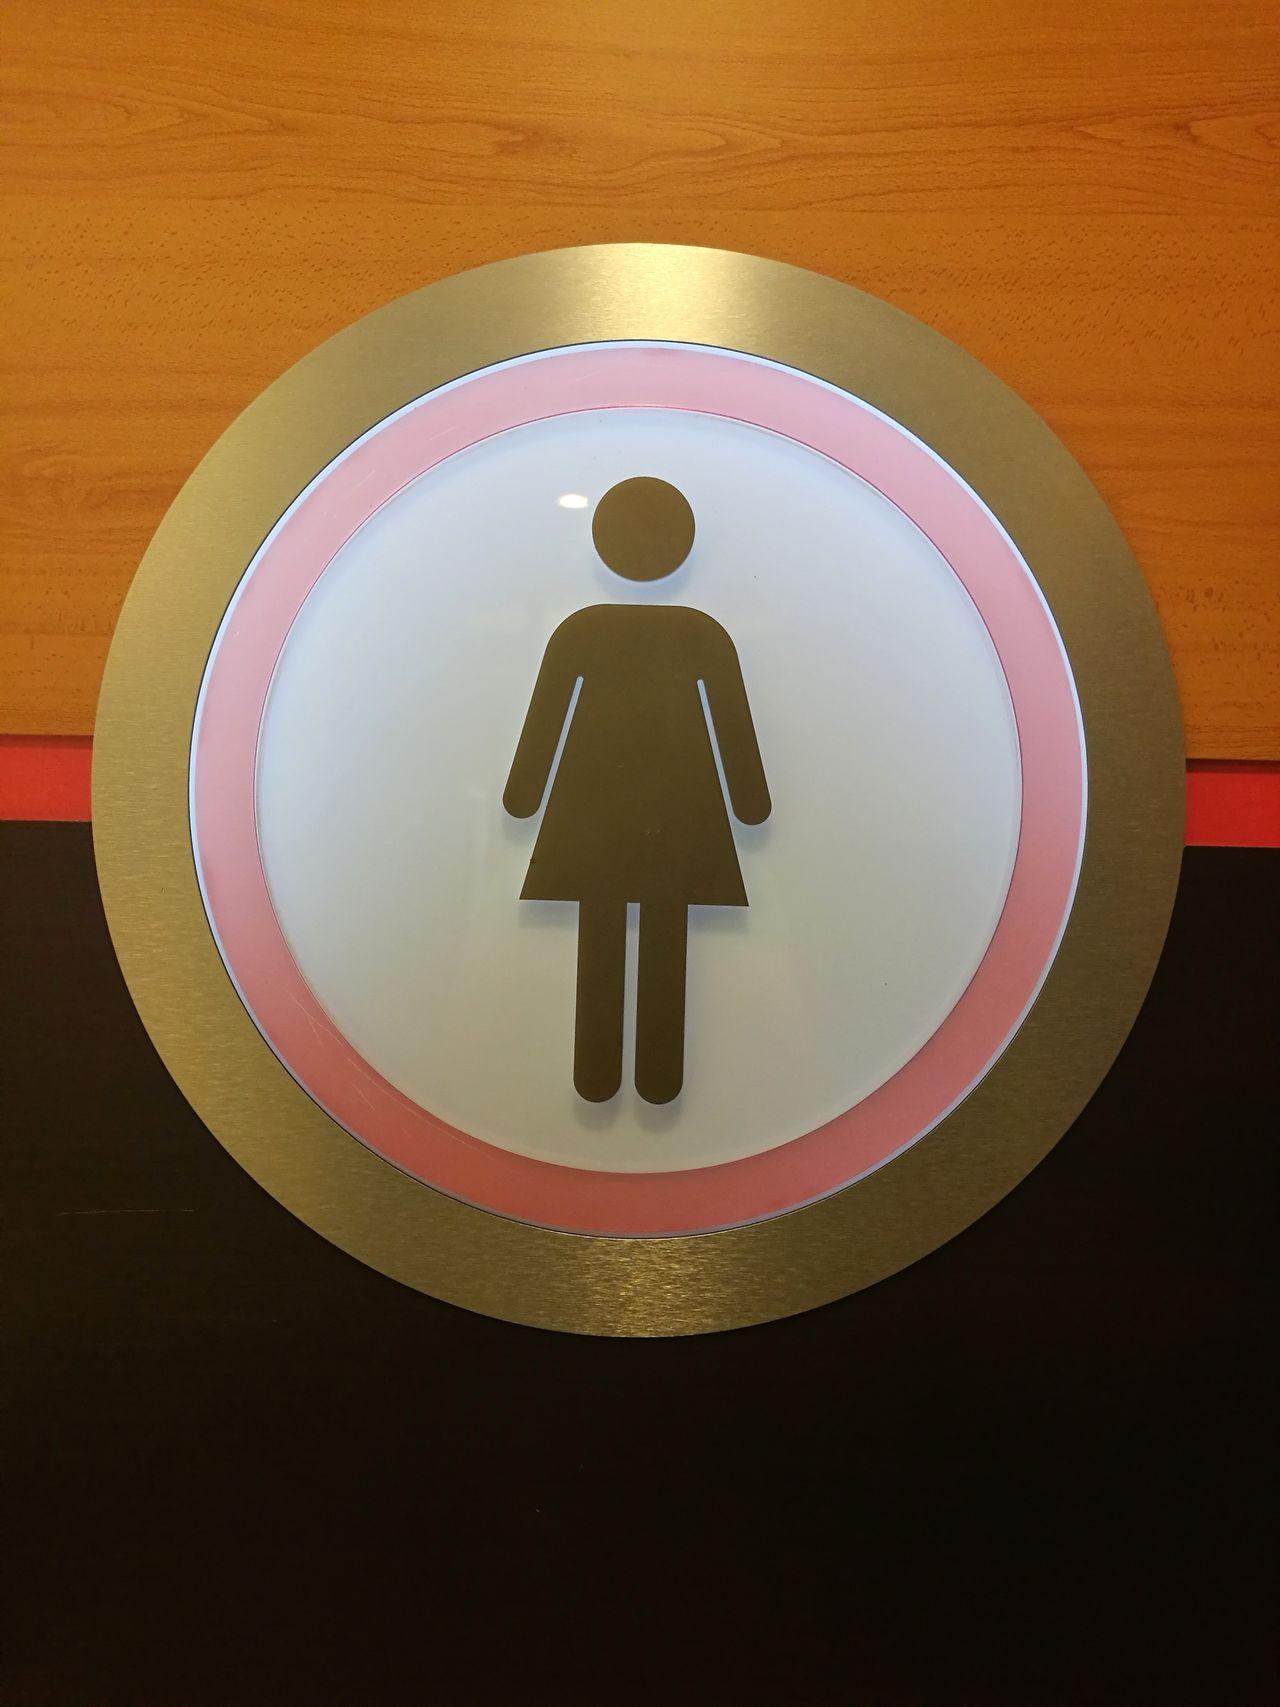 Circle Indoors  Wc Ladies Ladies Room Ladies Only  Woomen Wooman Woomen Door Woomen Room Bathroom Bathroom Art Bath